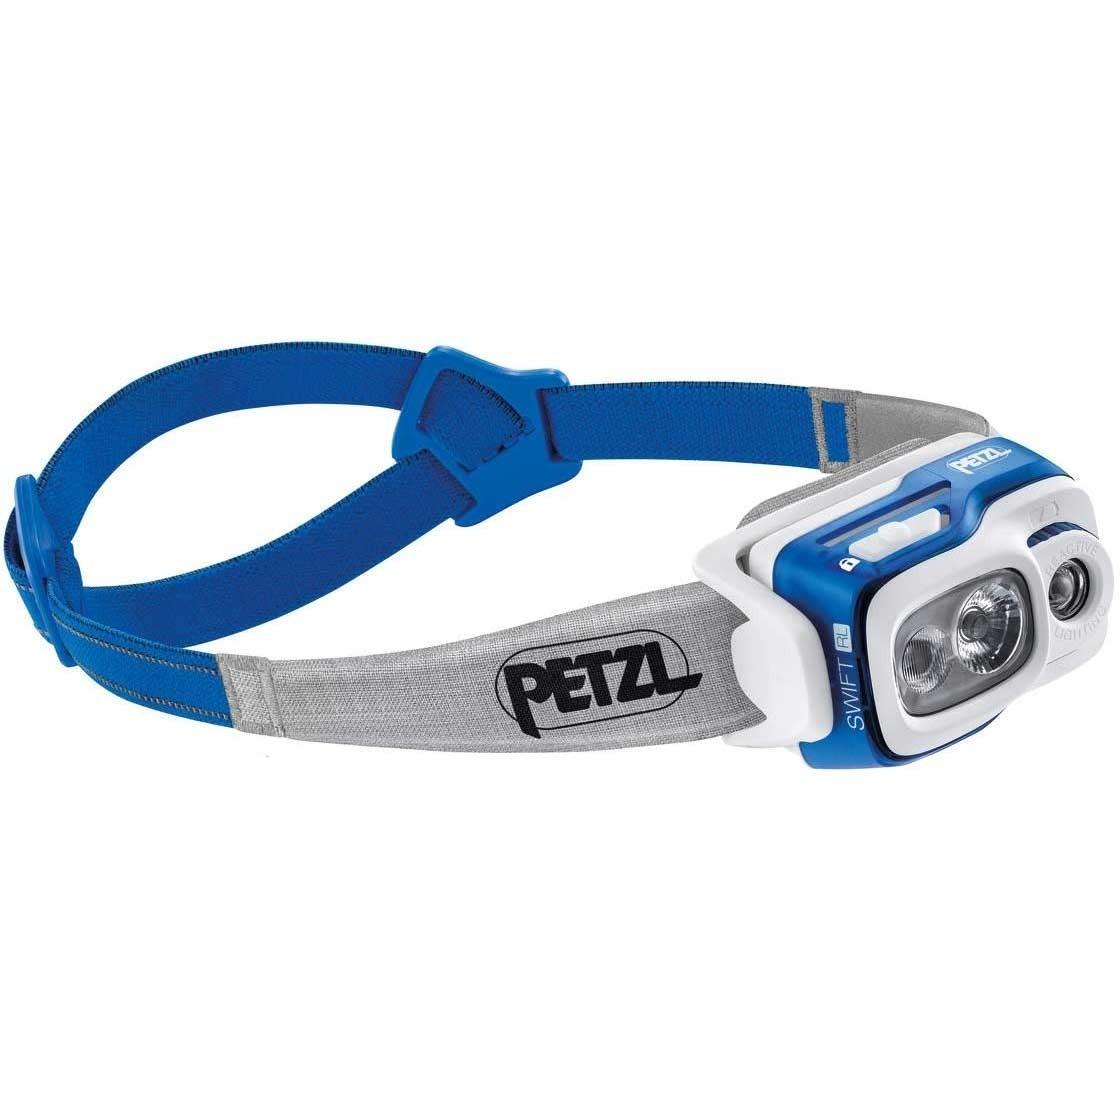 Petzl Swift RL Rechargeable Headtorch - Blue